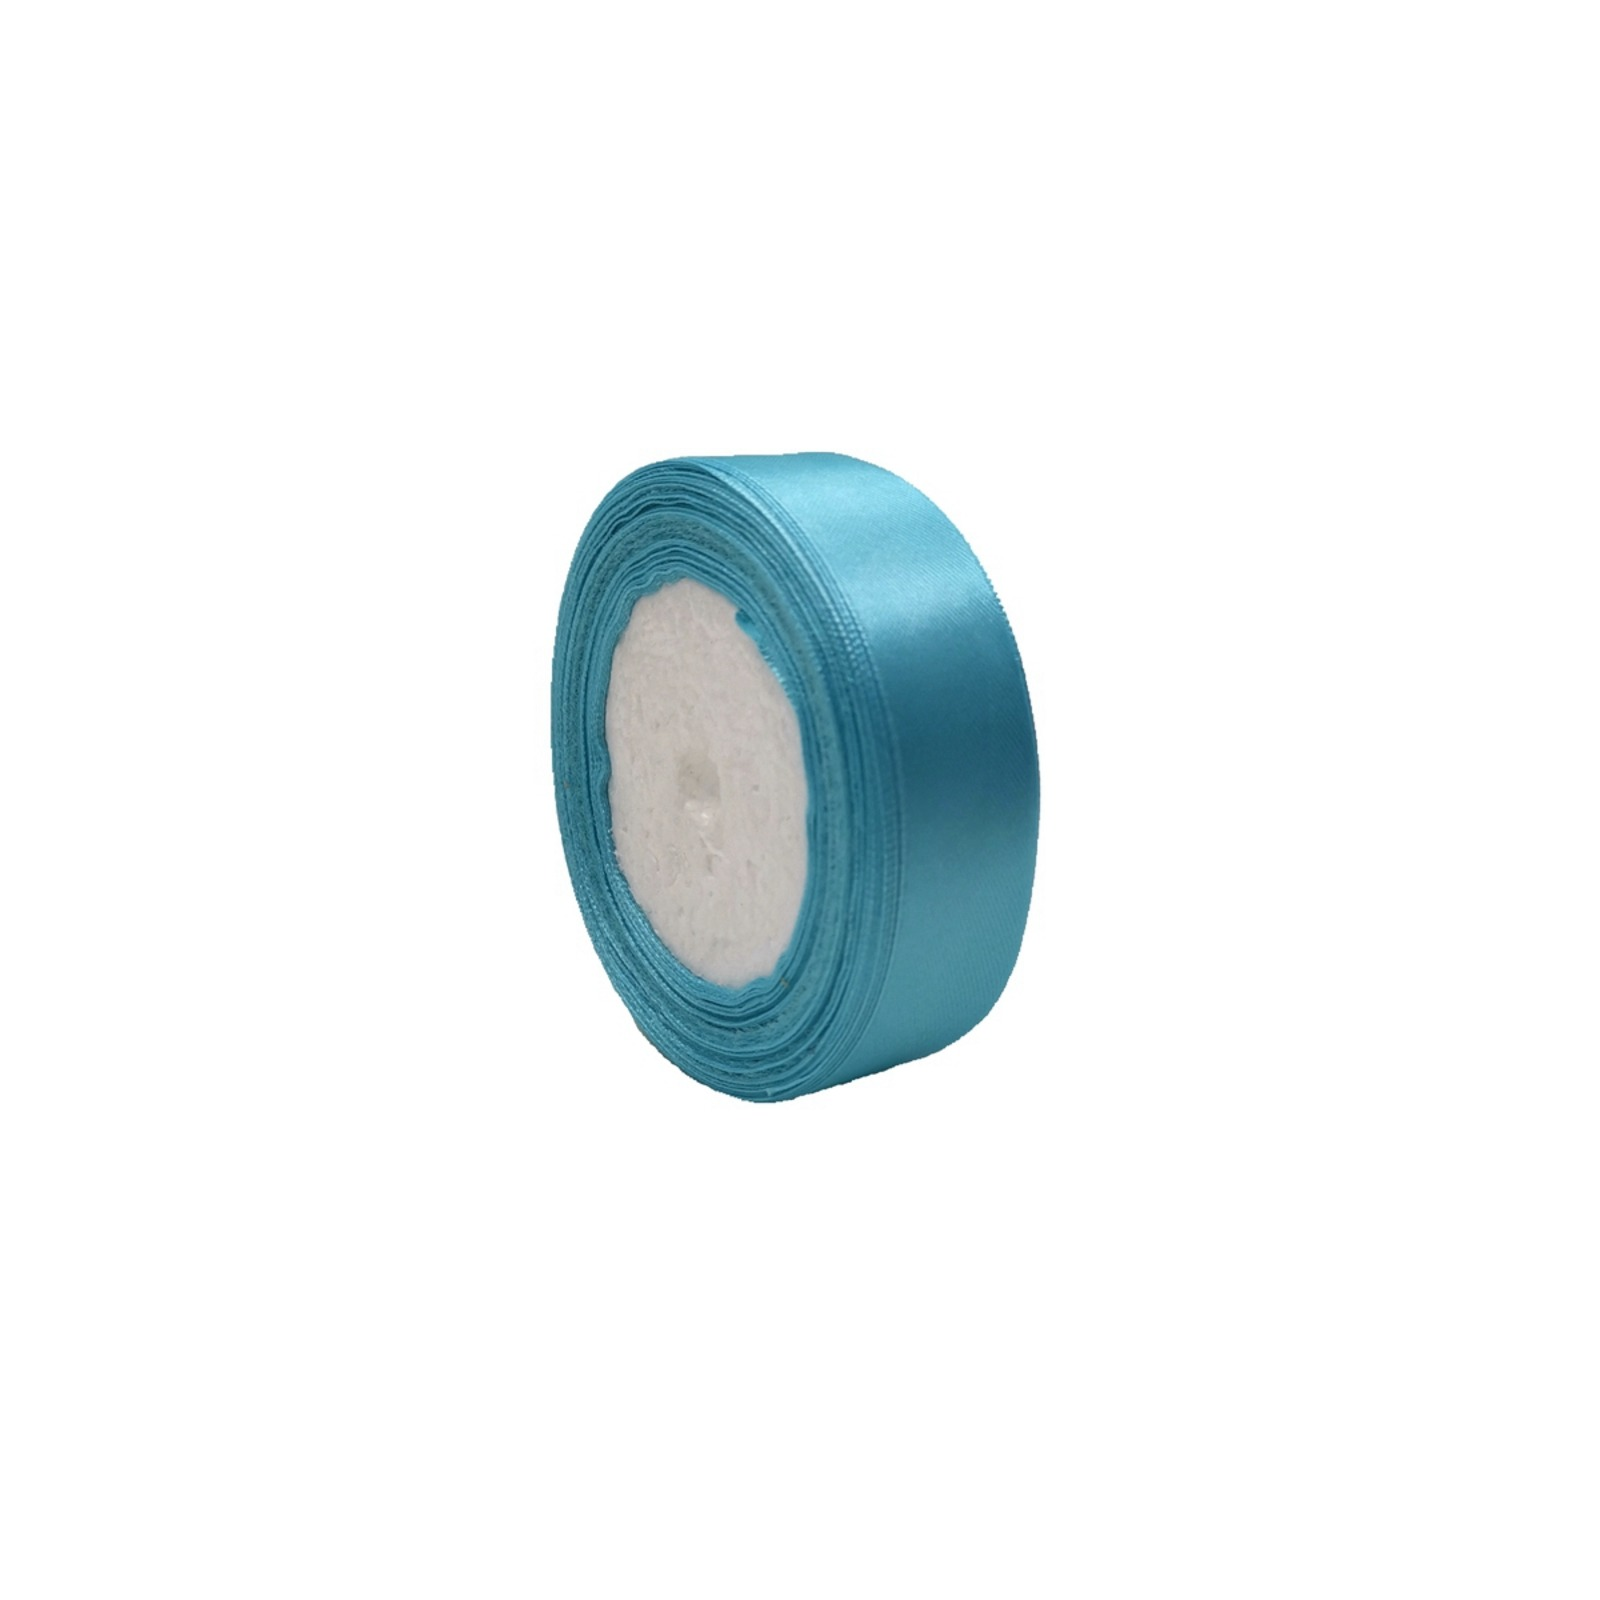 VIP Ribbon 2.5cm x 22.5m - Light Blue